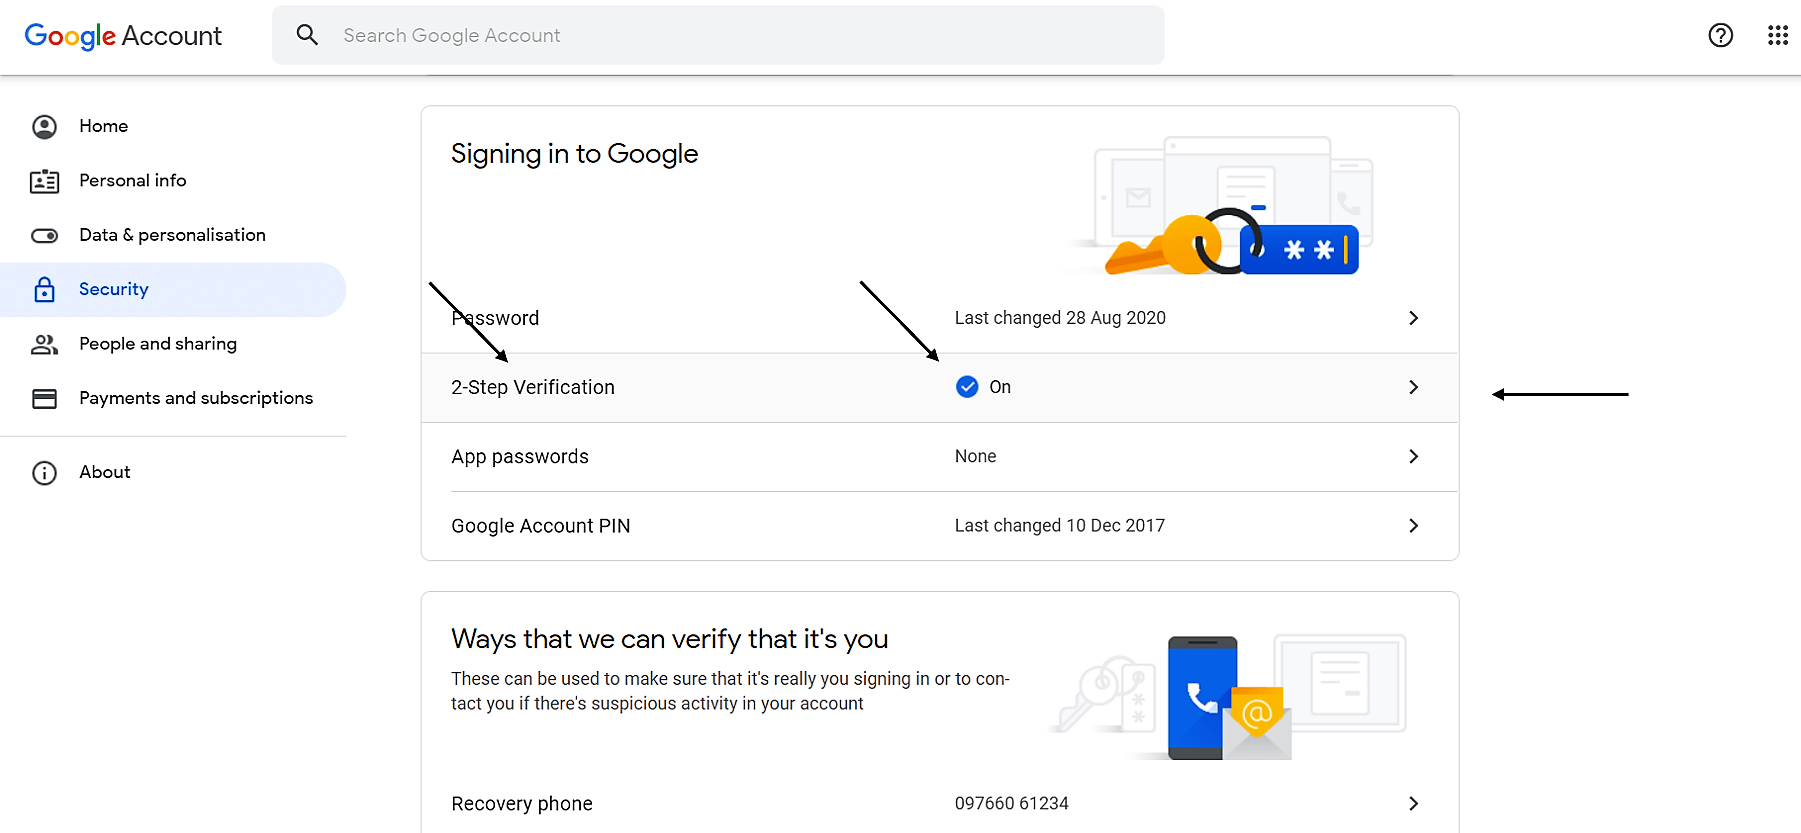 Google account Security – Turn on 2-Step Verification